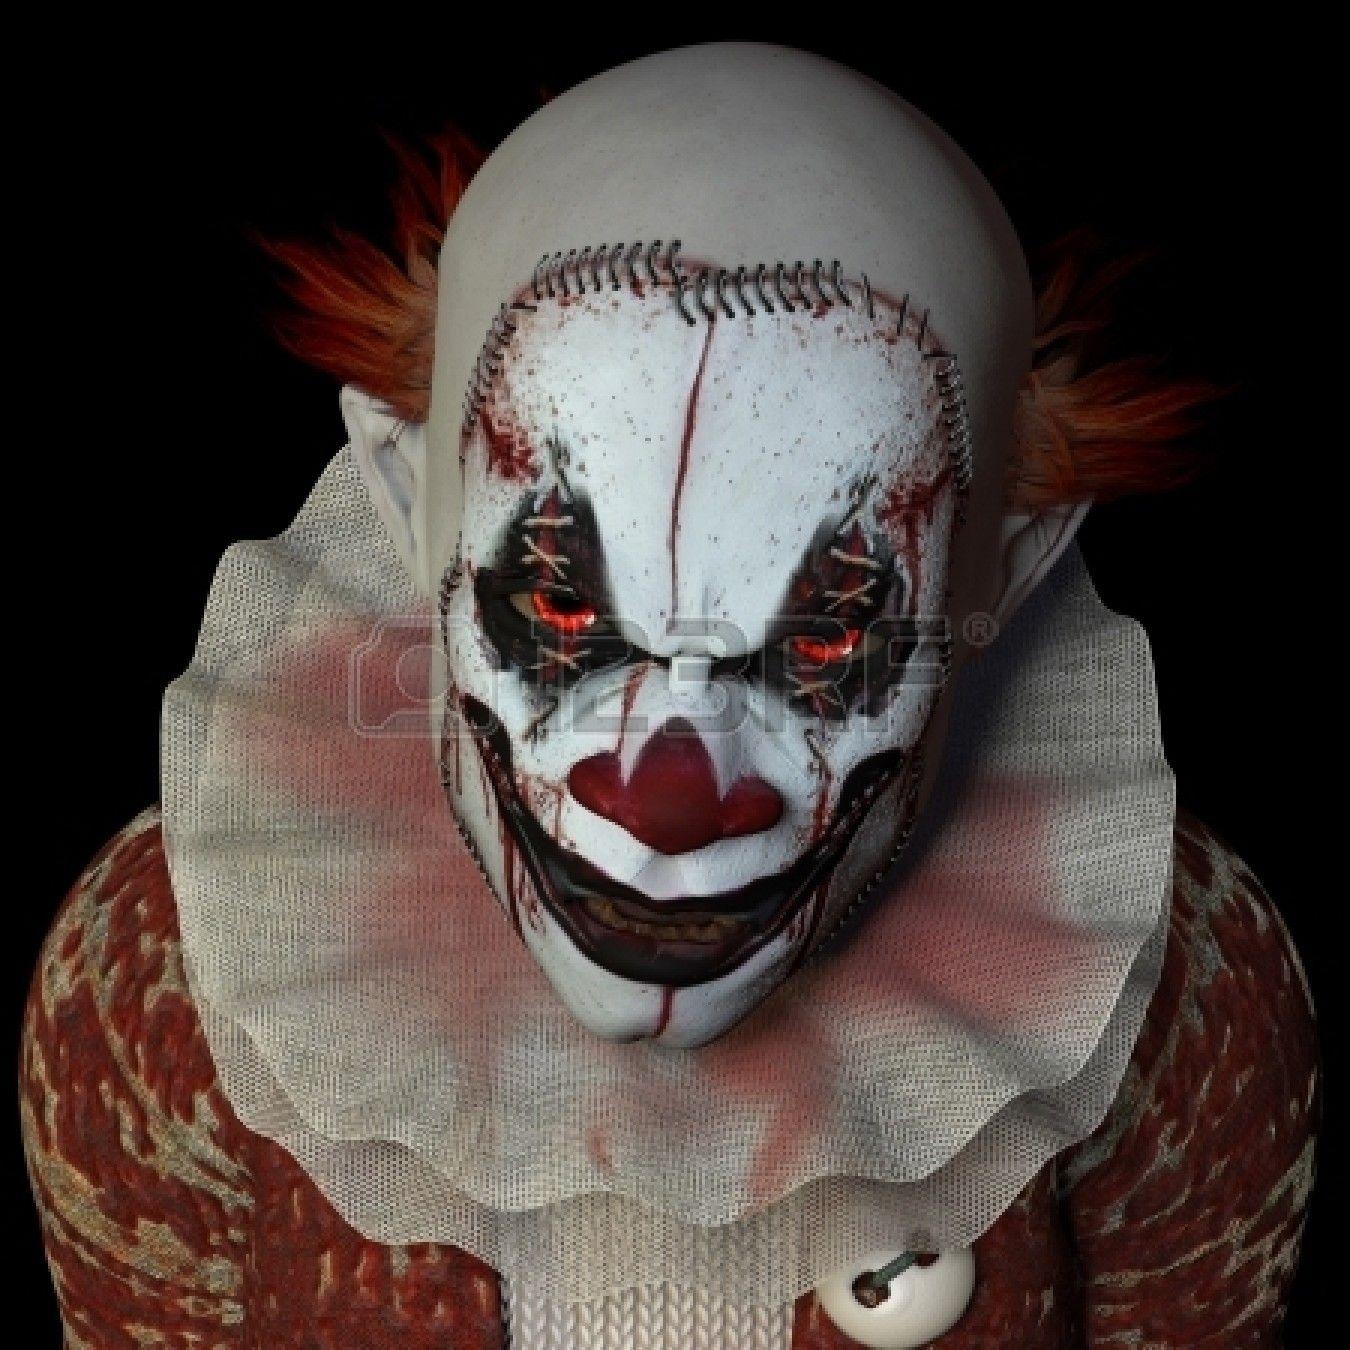 Clowns by Michael Kamp #BookReview - Sci-Fi